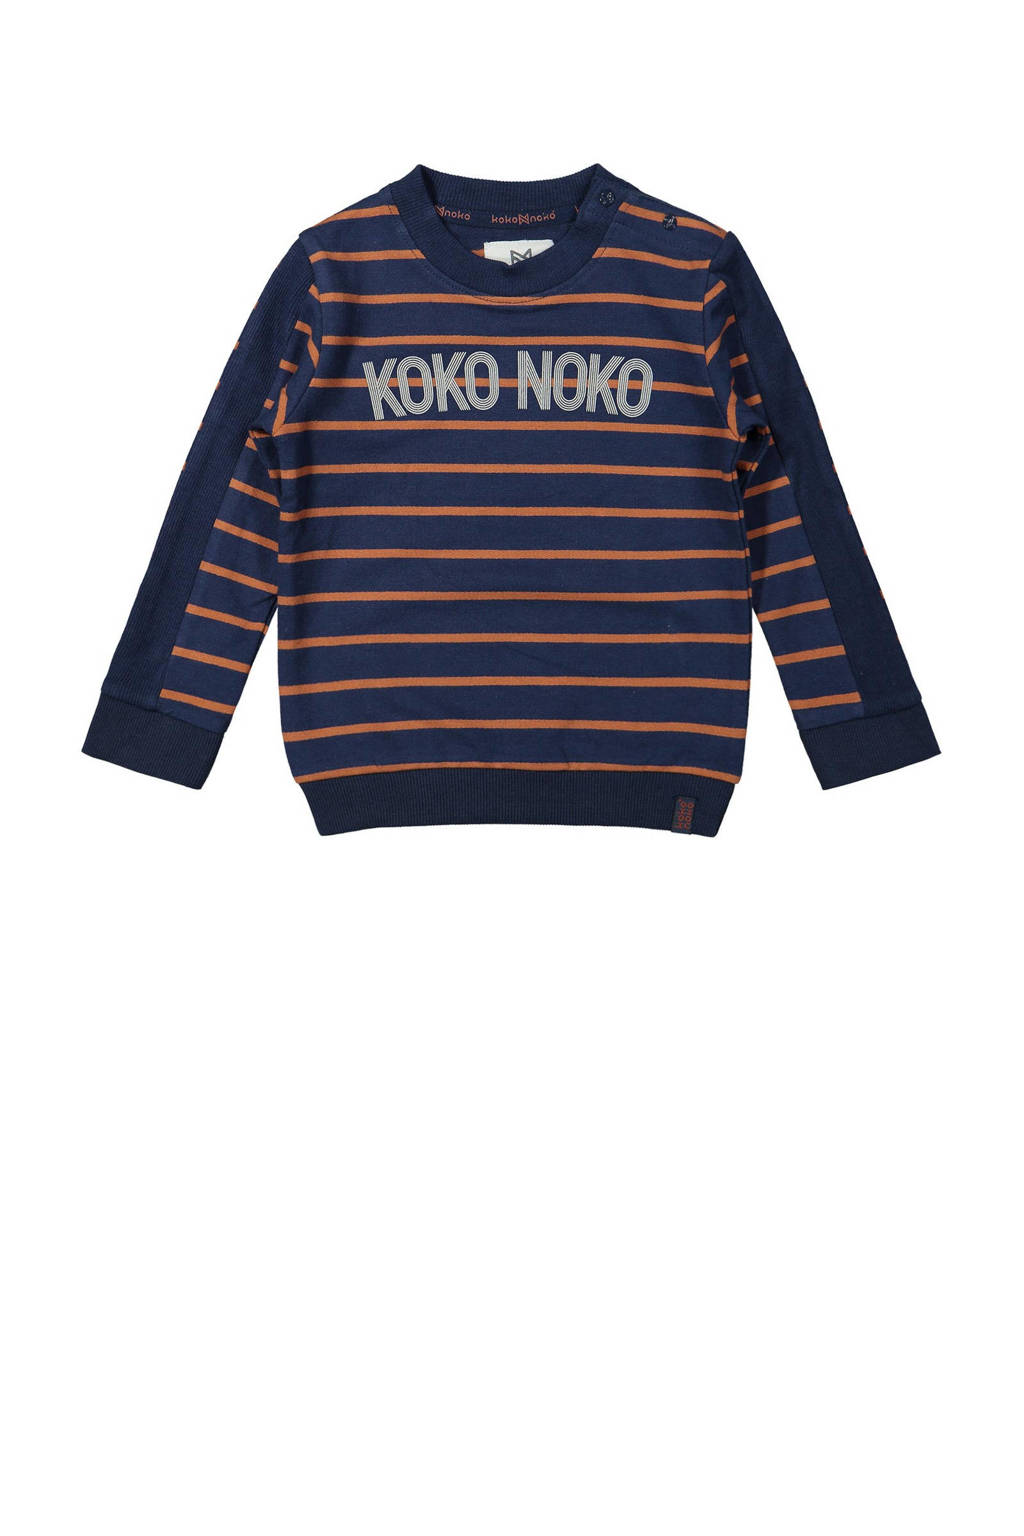 Koko Noko sweater met logo donkerblauw/camel, Donkerblauw/camel